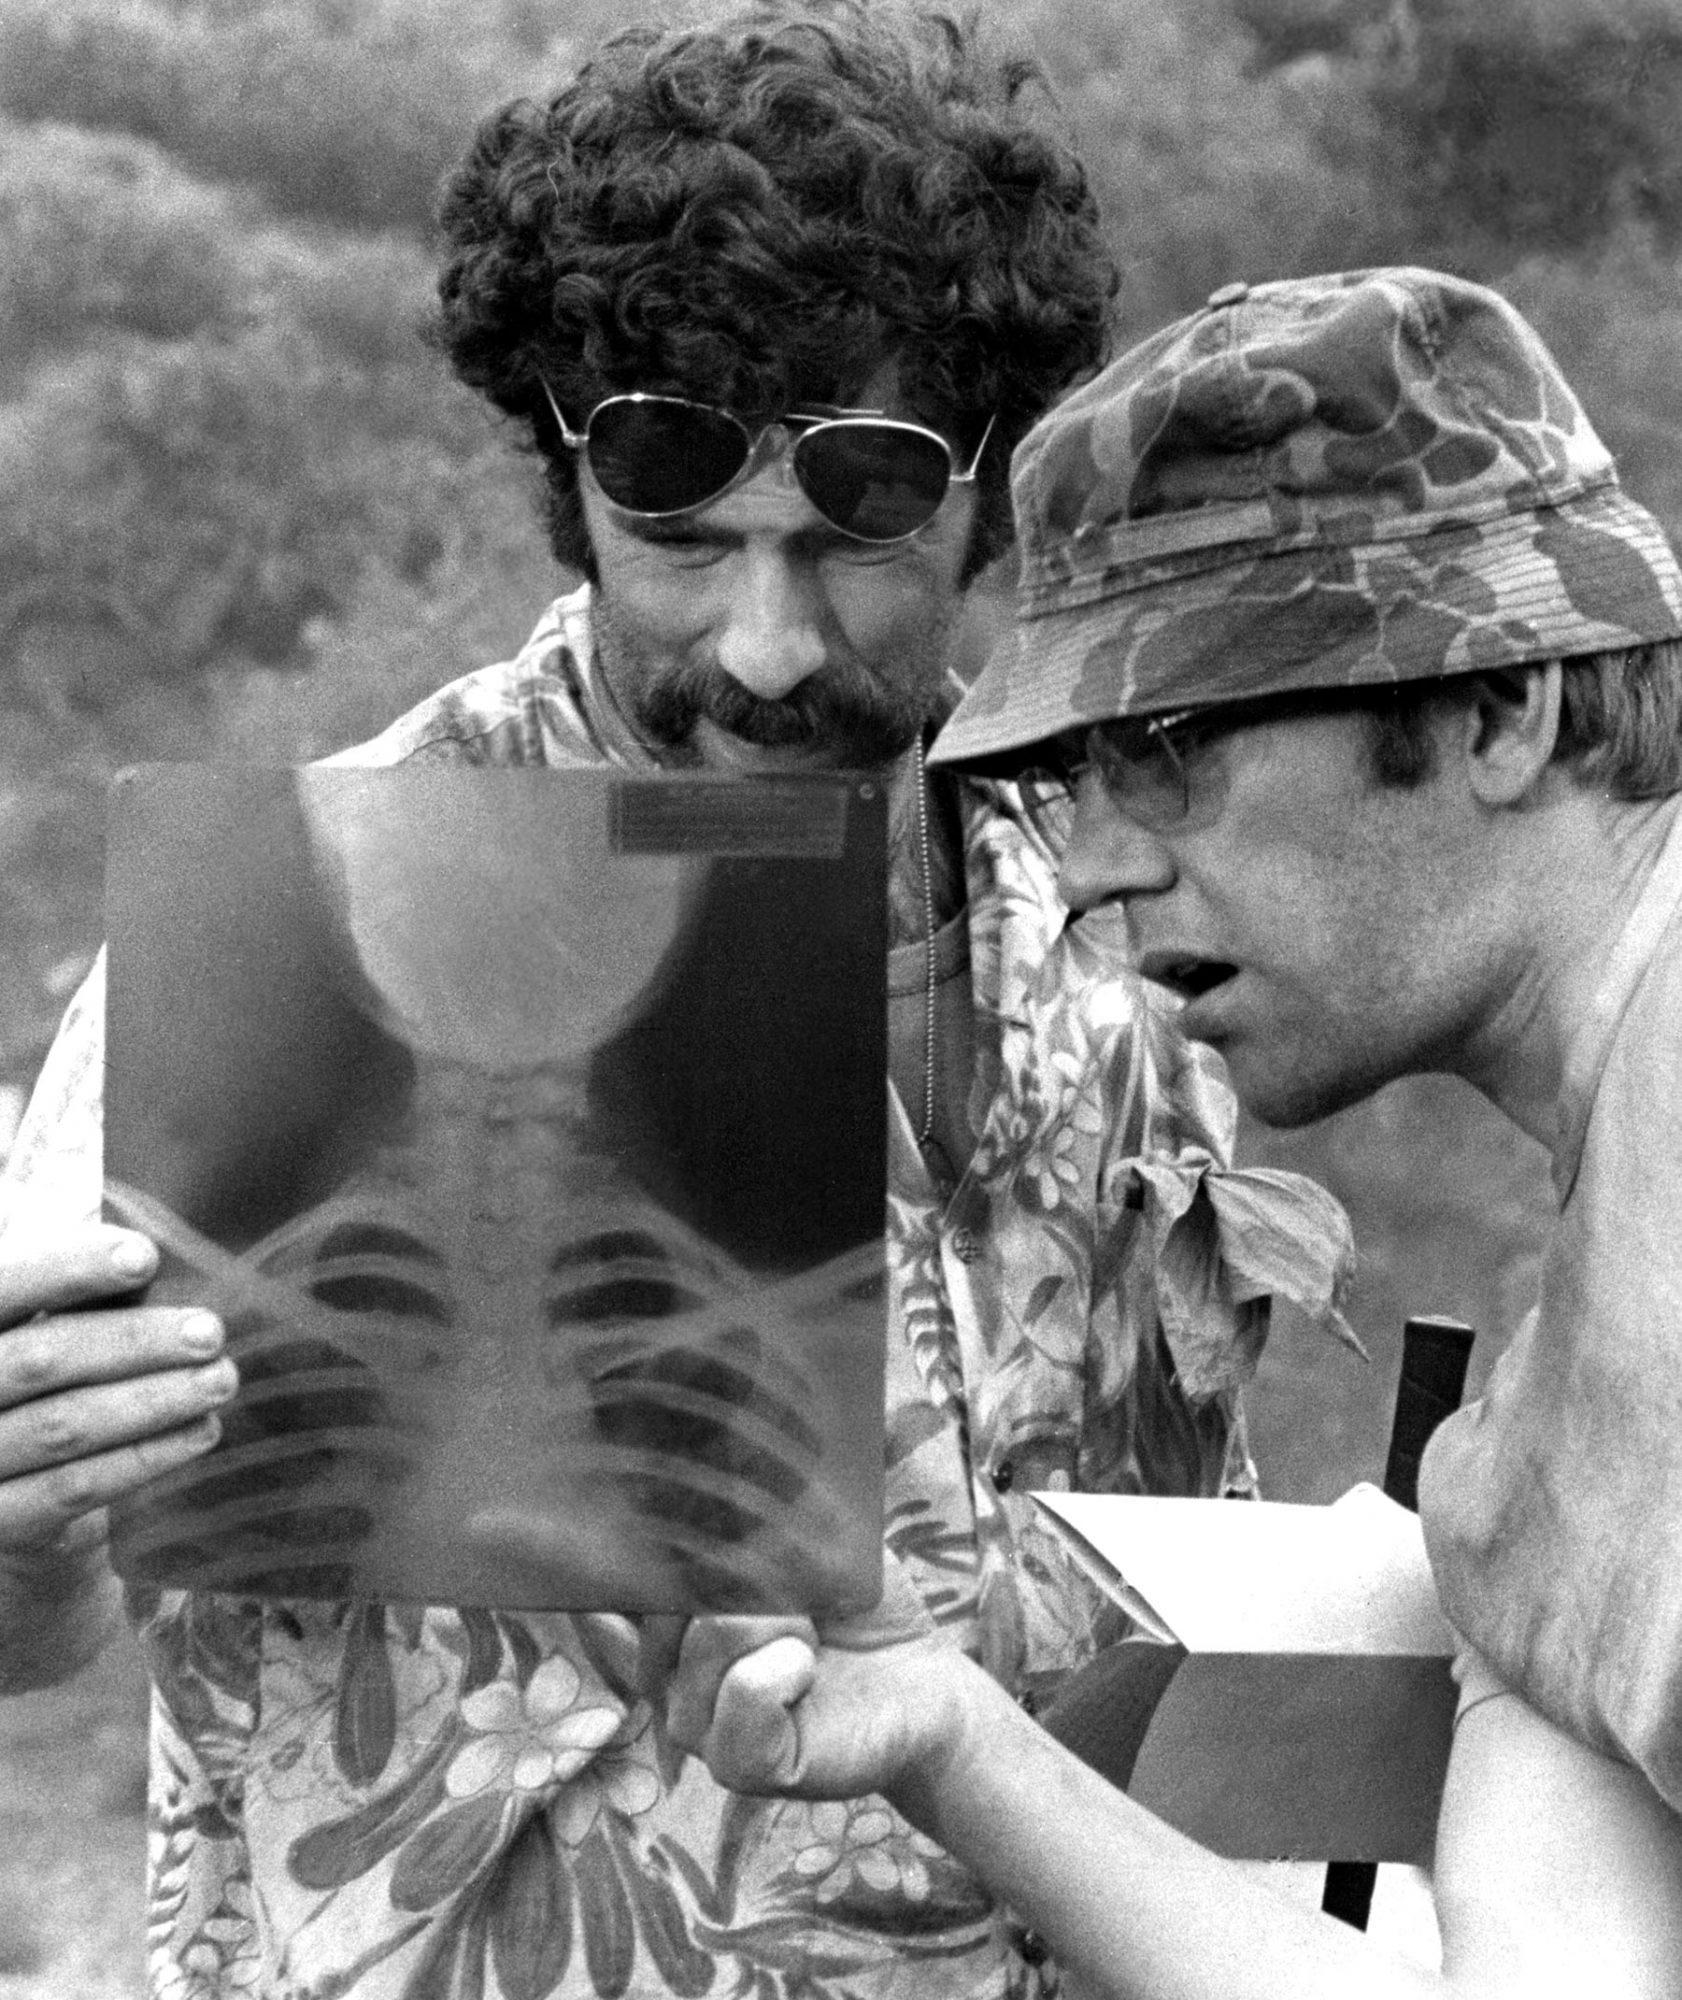 MASH, Elliott Gould, Donald Sutherland, 1970 TM and Copyright (c) 20th Century Fox Film Corp. All r